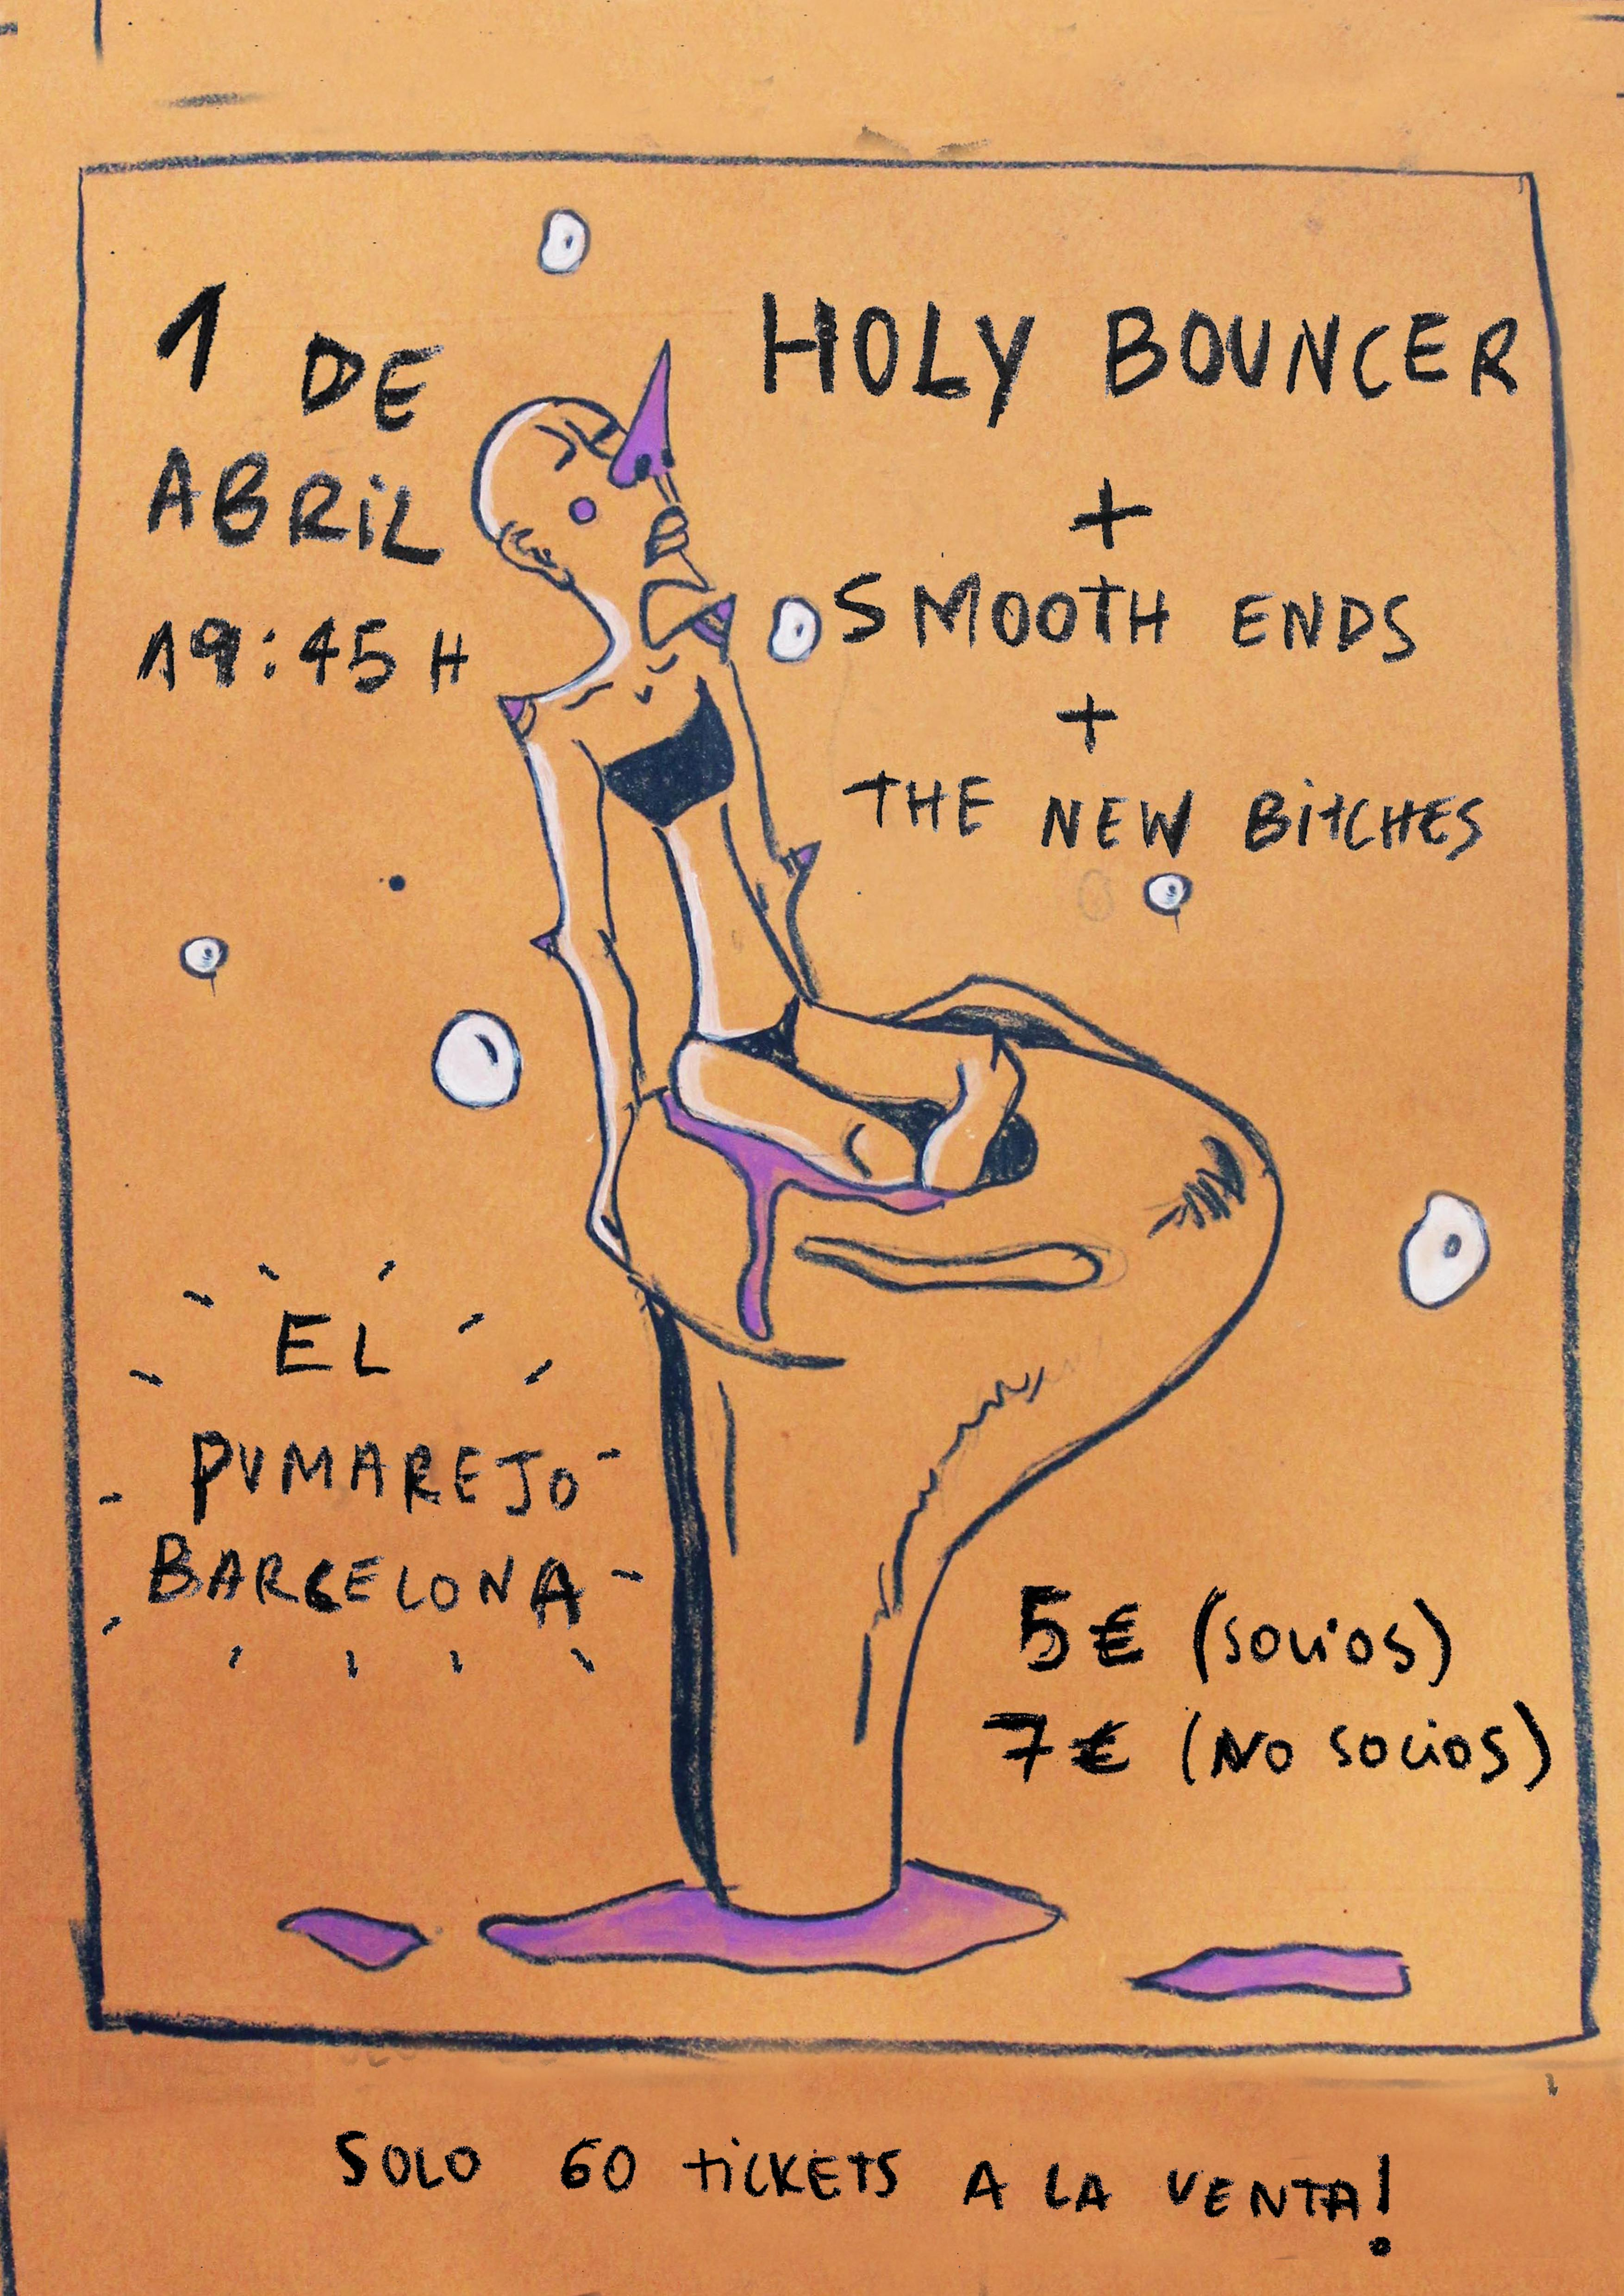 Holy Bouncer - Barcelona